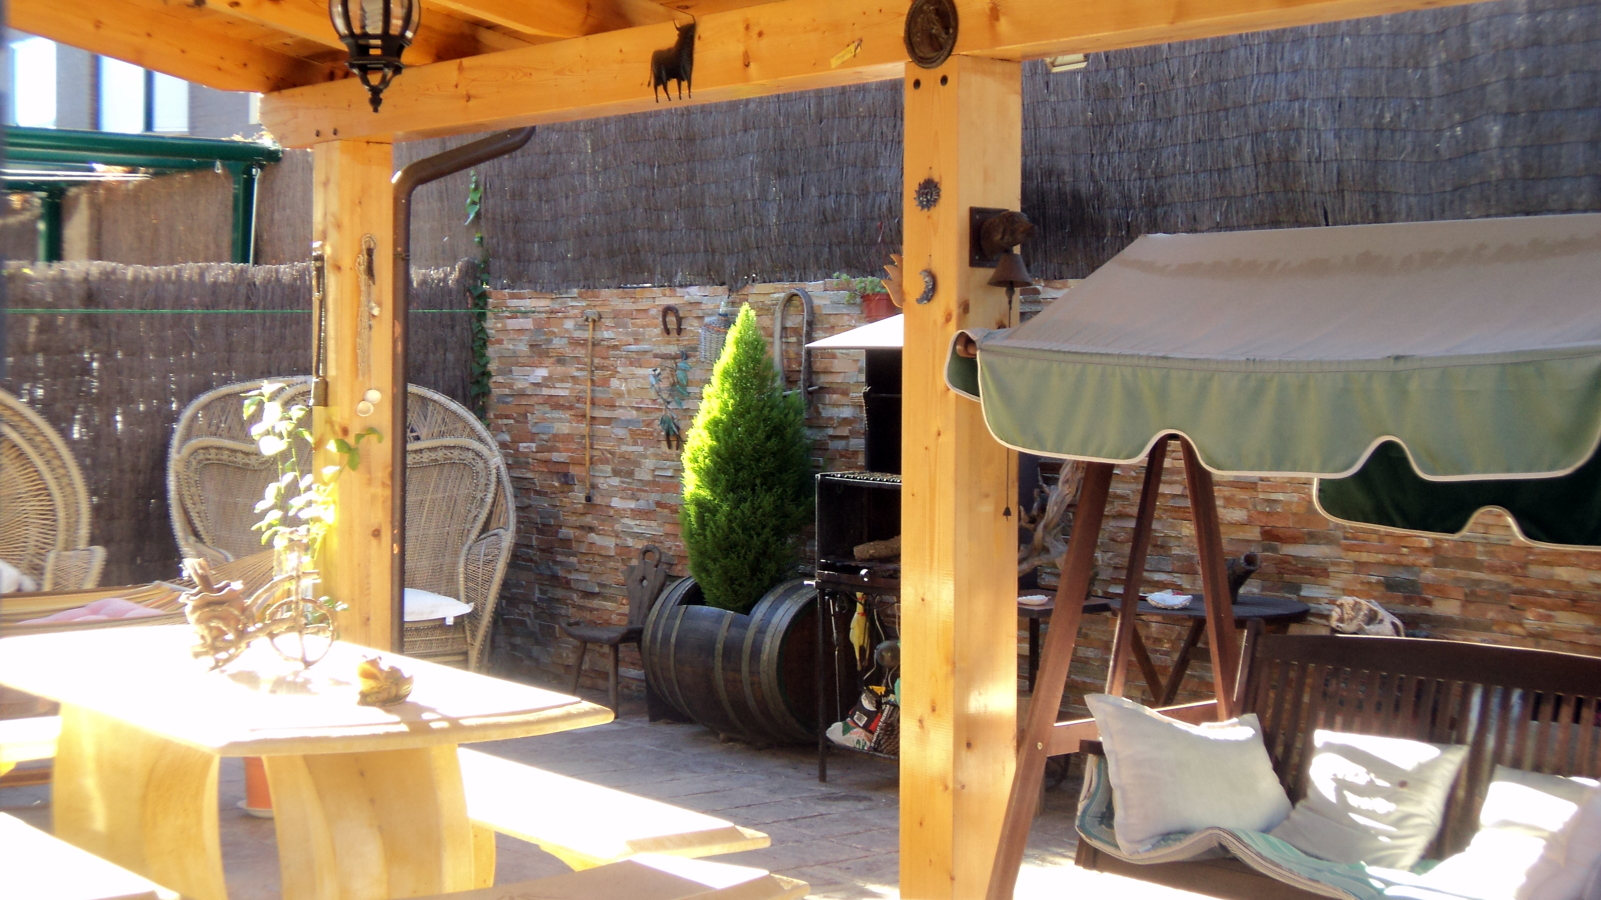 Foto realizacion de porches de madera de obras el paleta - Madera para porches ...